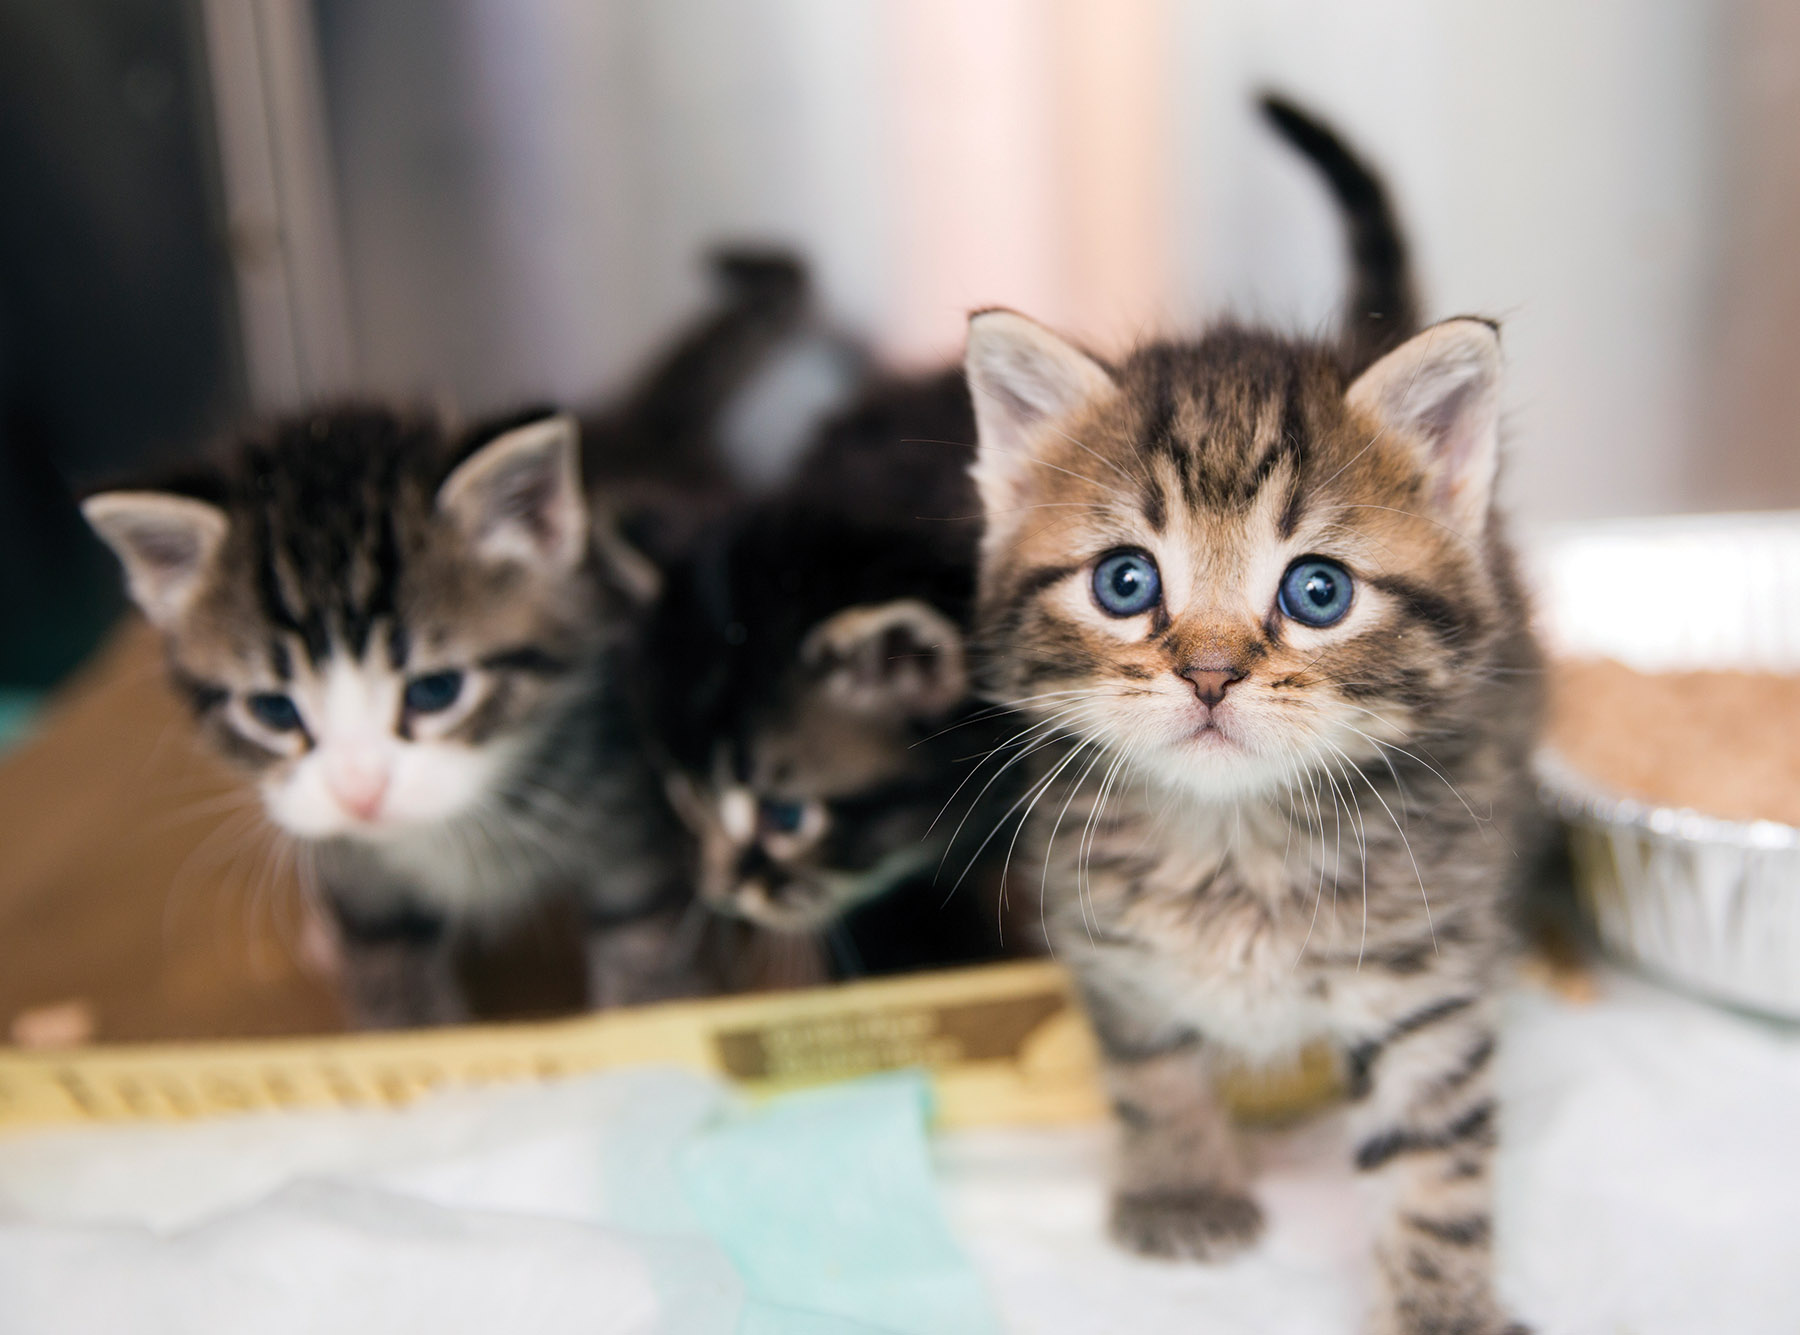 Everything s ing Up Kittens at Best Friends Kitten Nursery